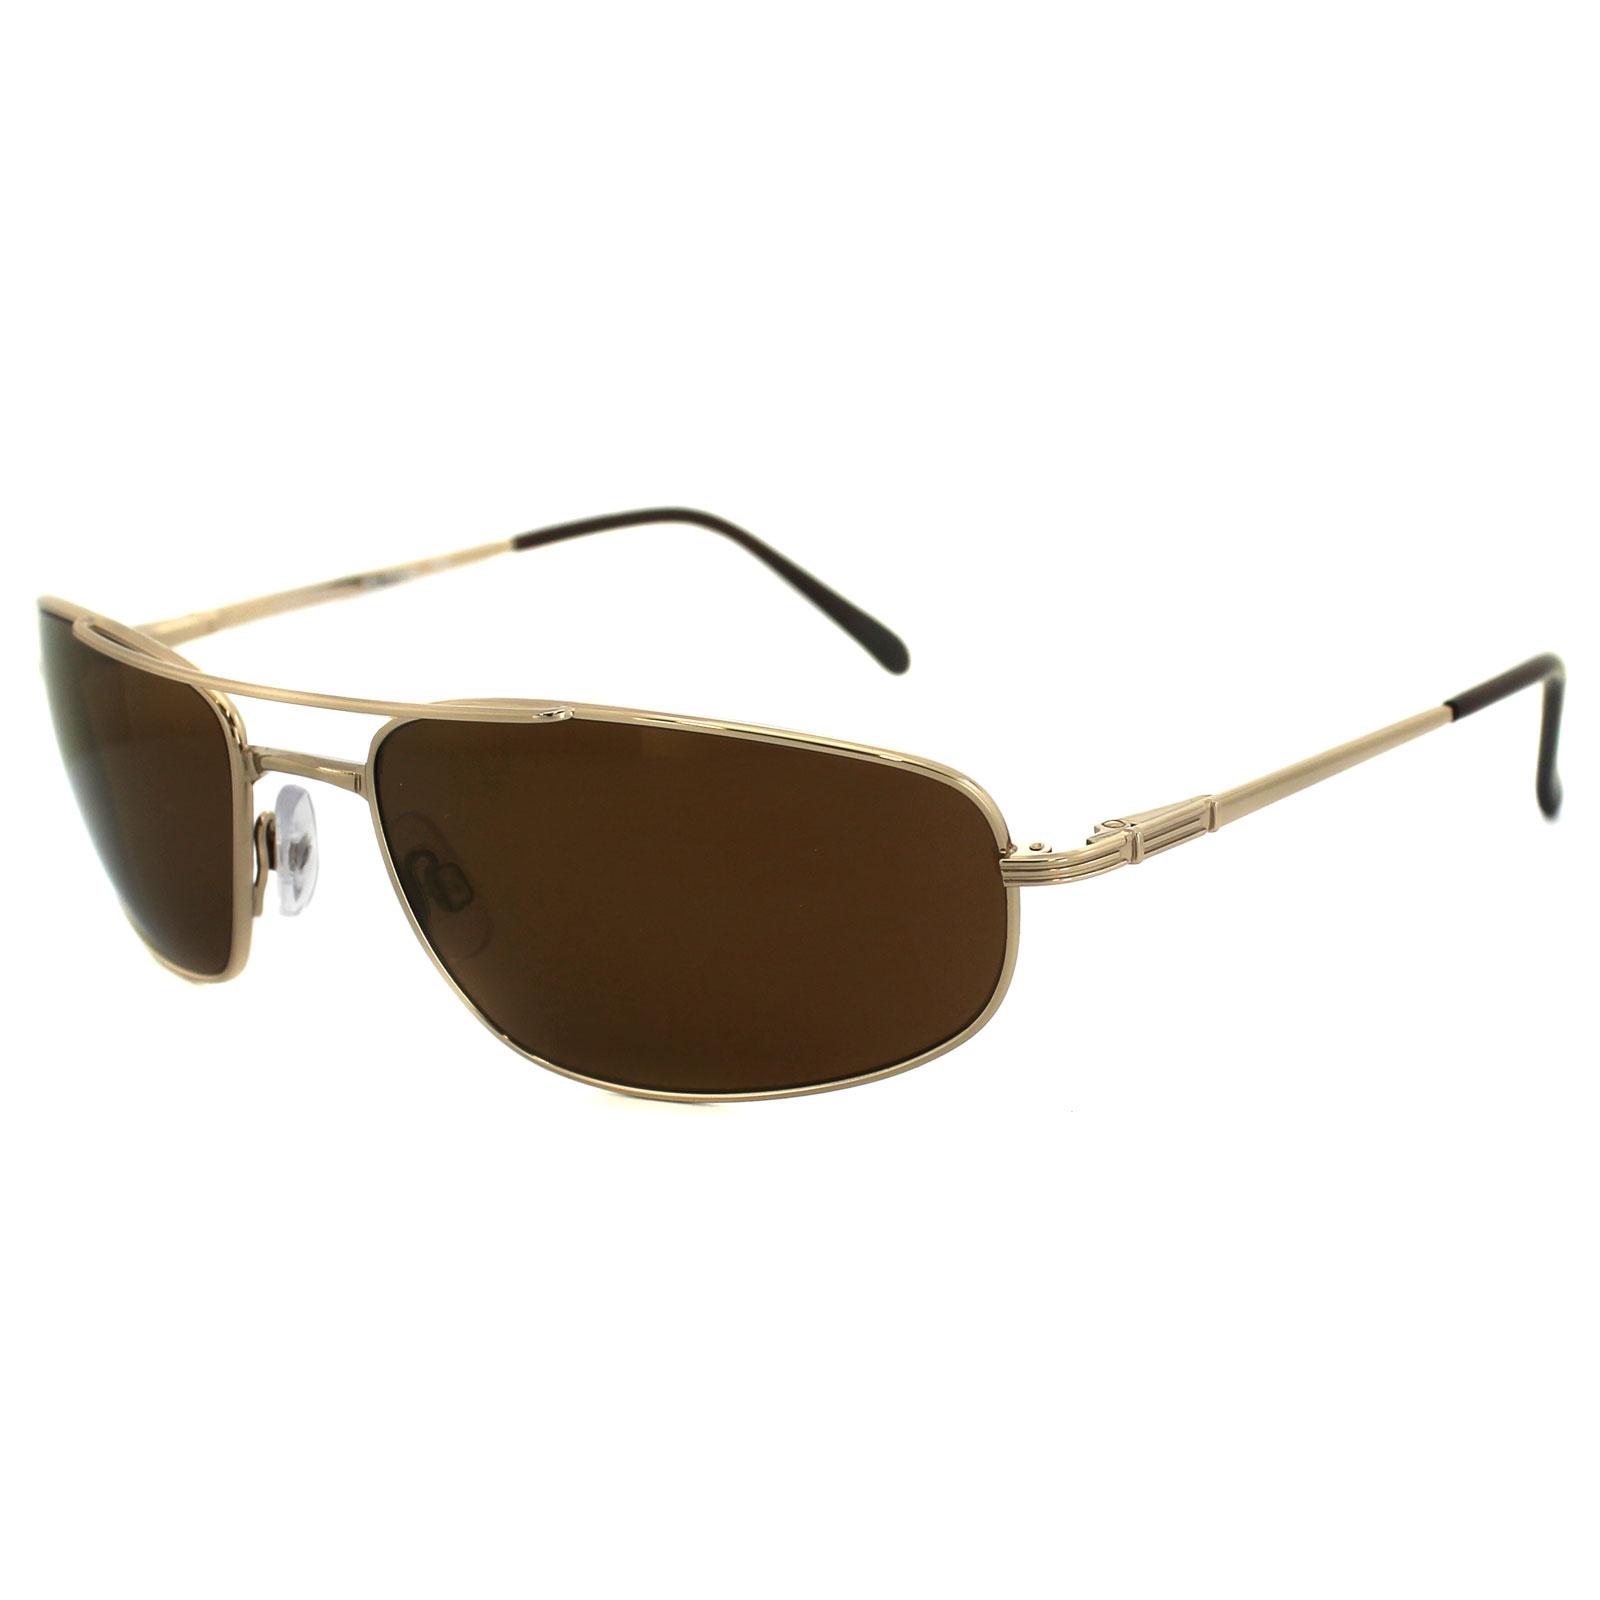 b4a03f6597 Velocity Polarized Sunglasses Is India Price